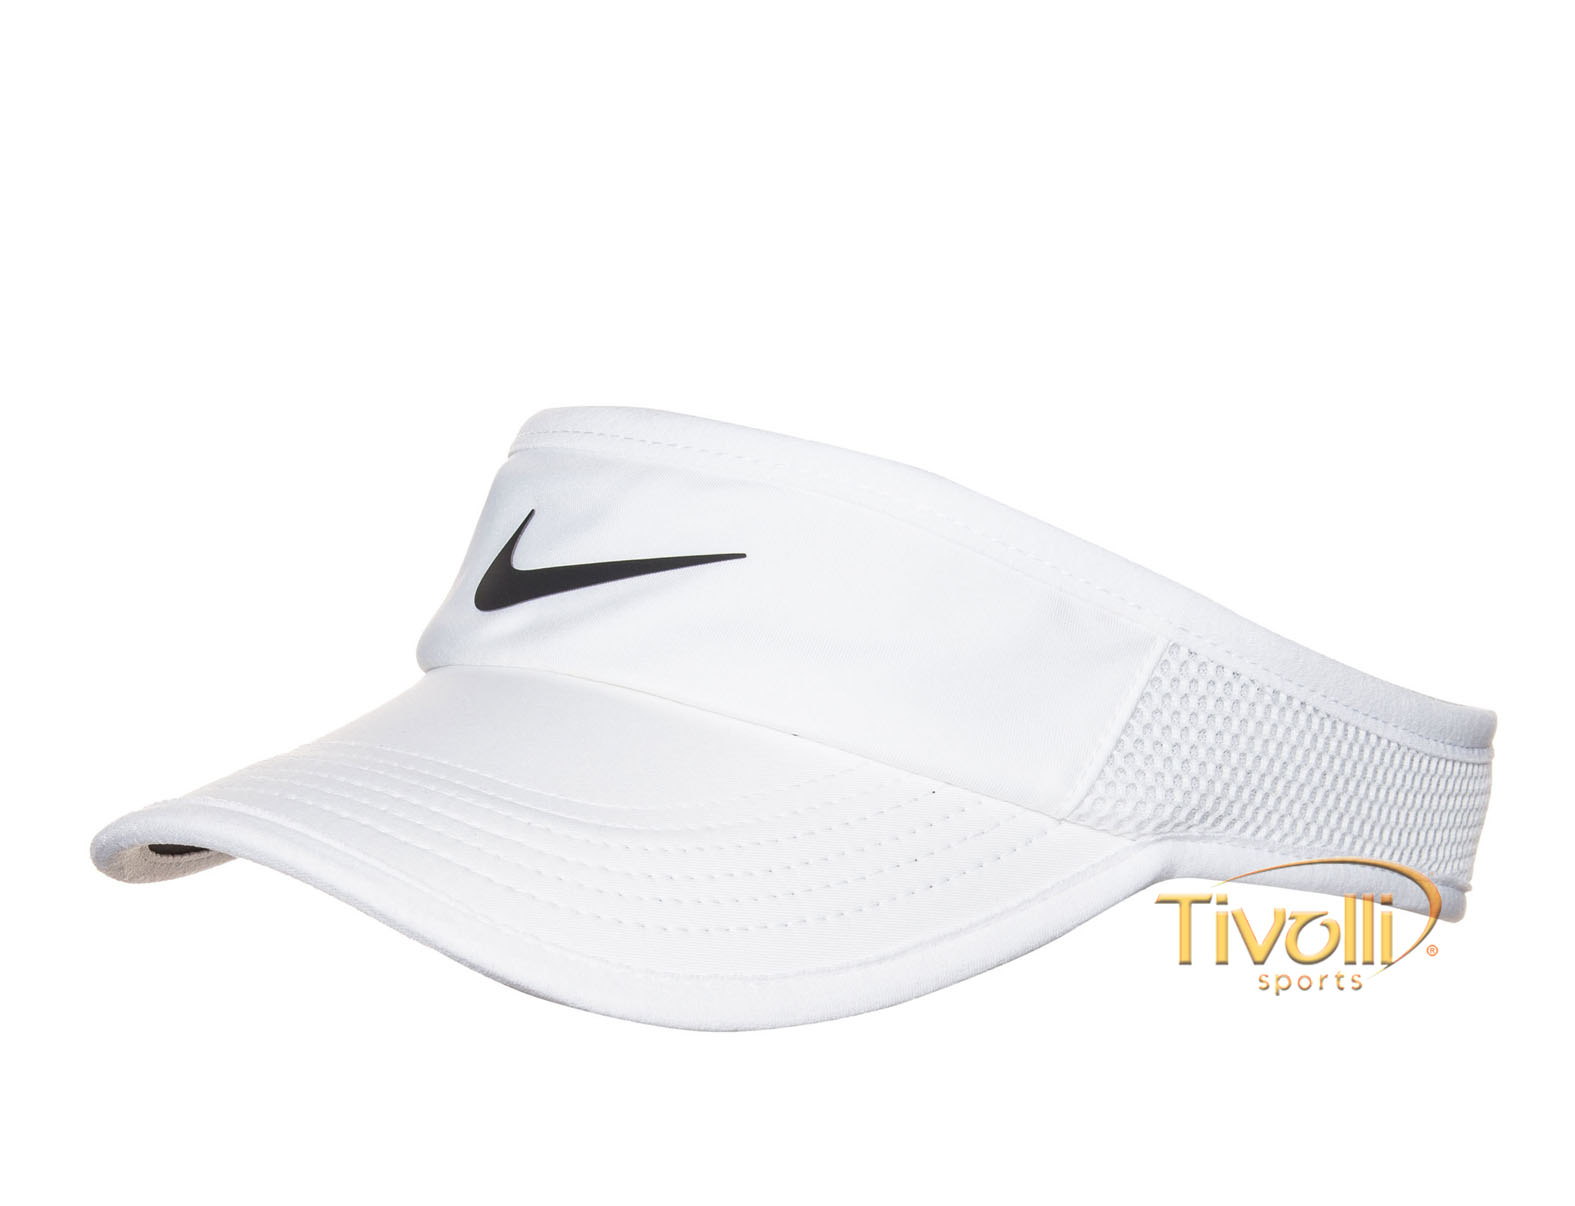 Raquete Mania   Viseira Nike   Featherlight Branca 2e235665950